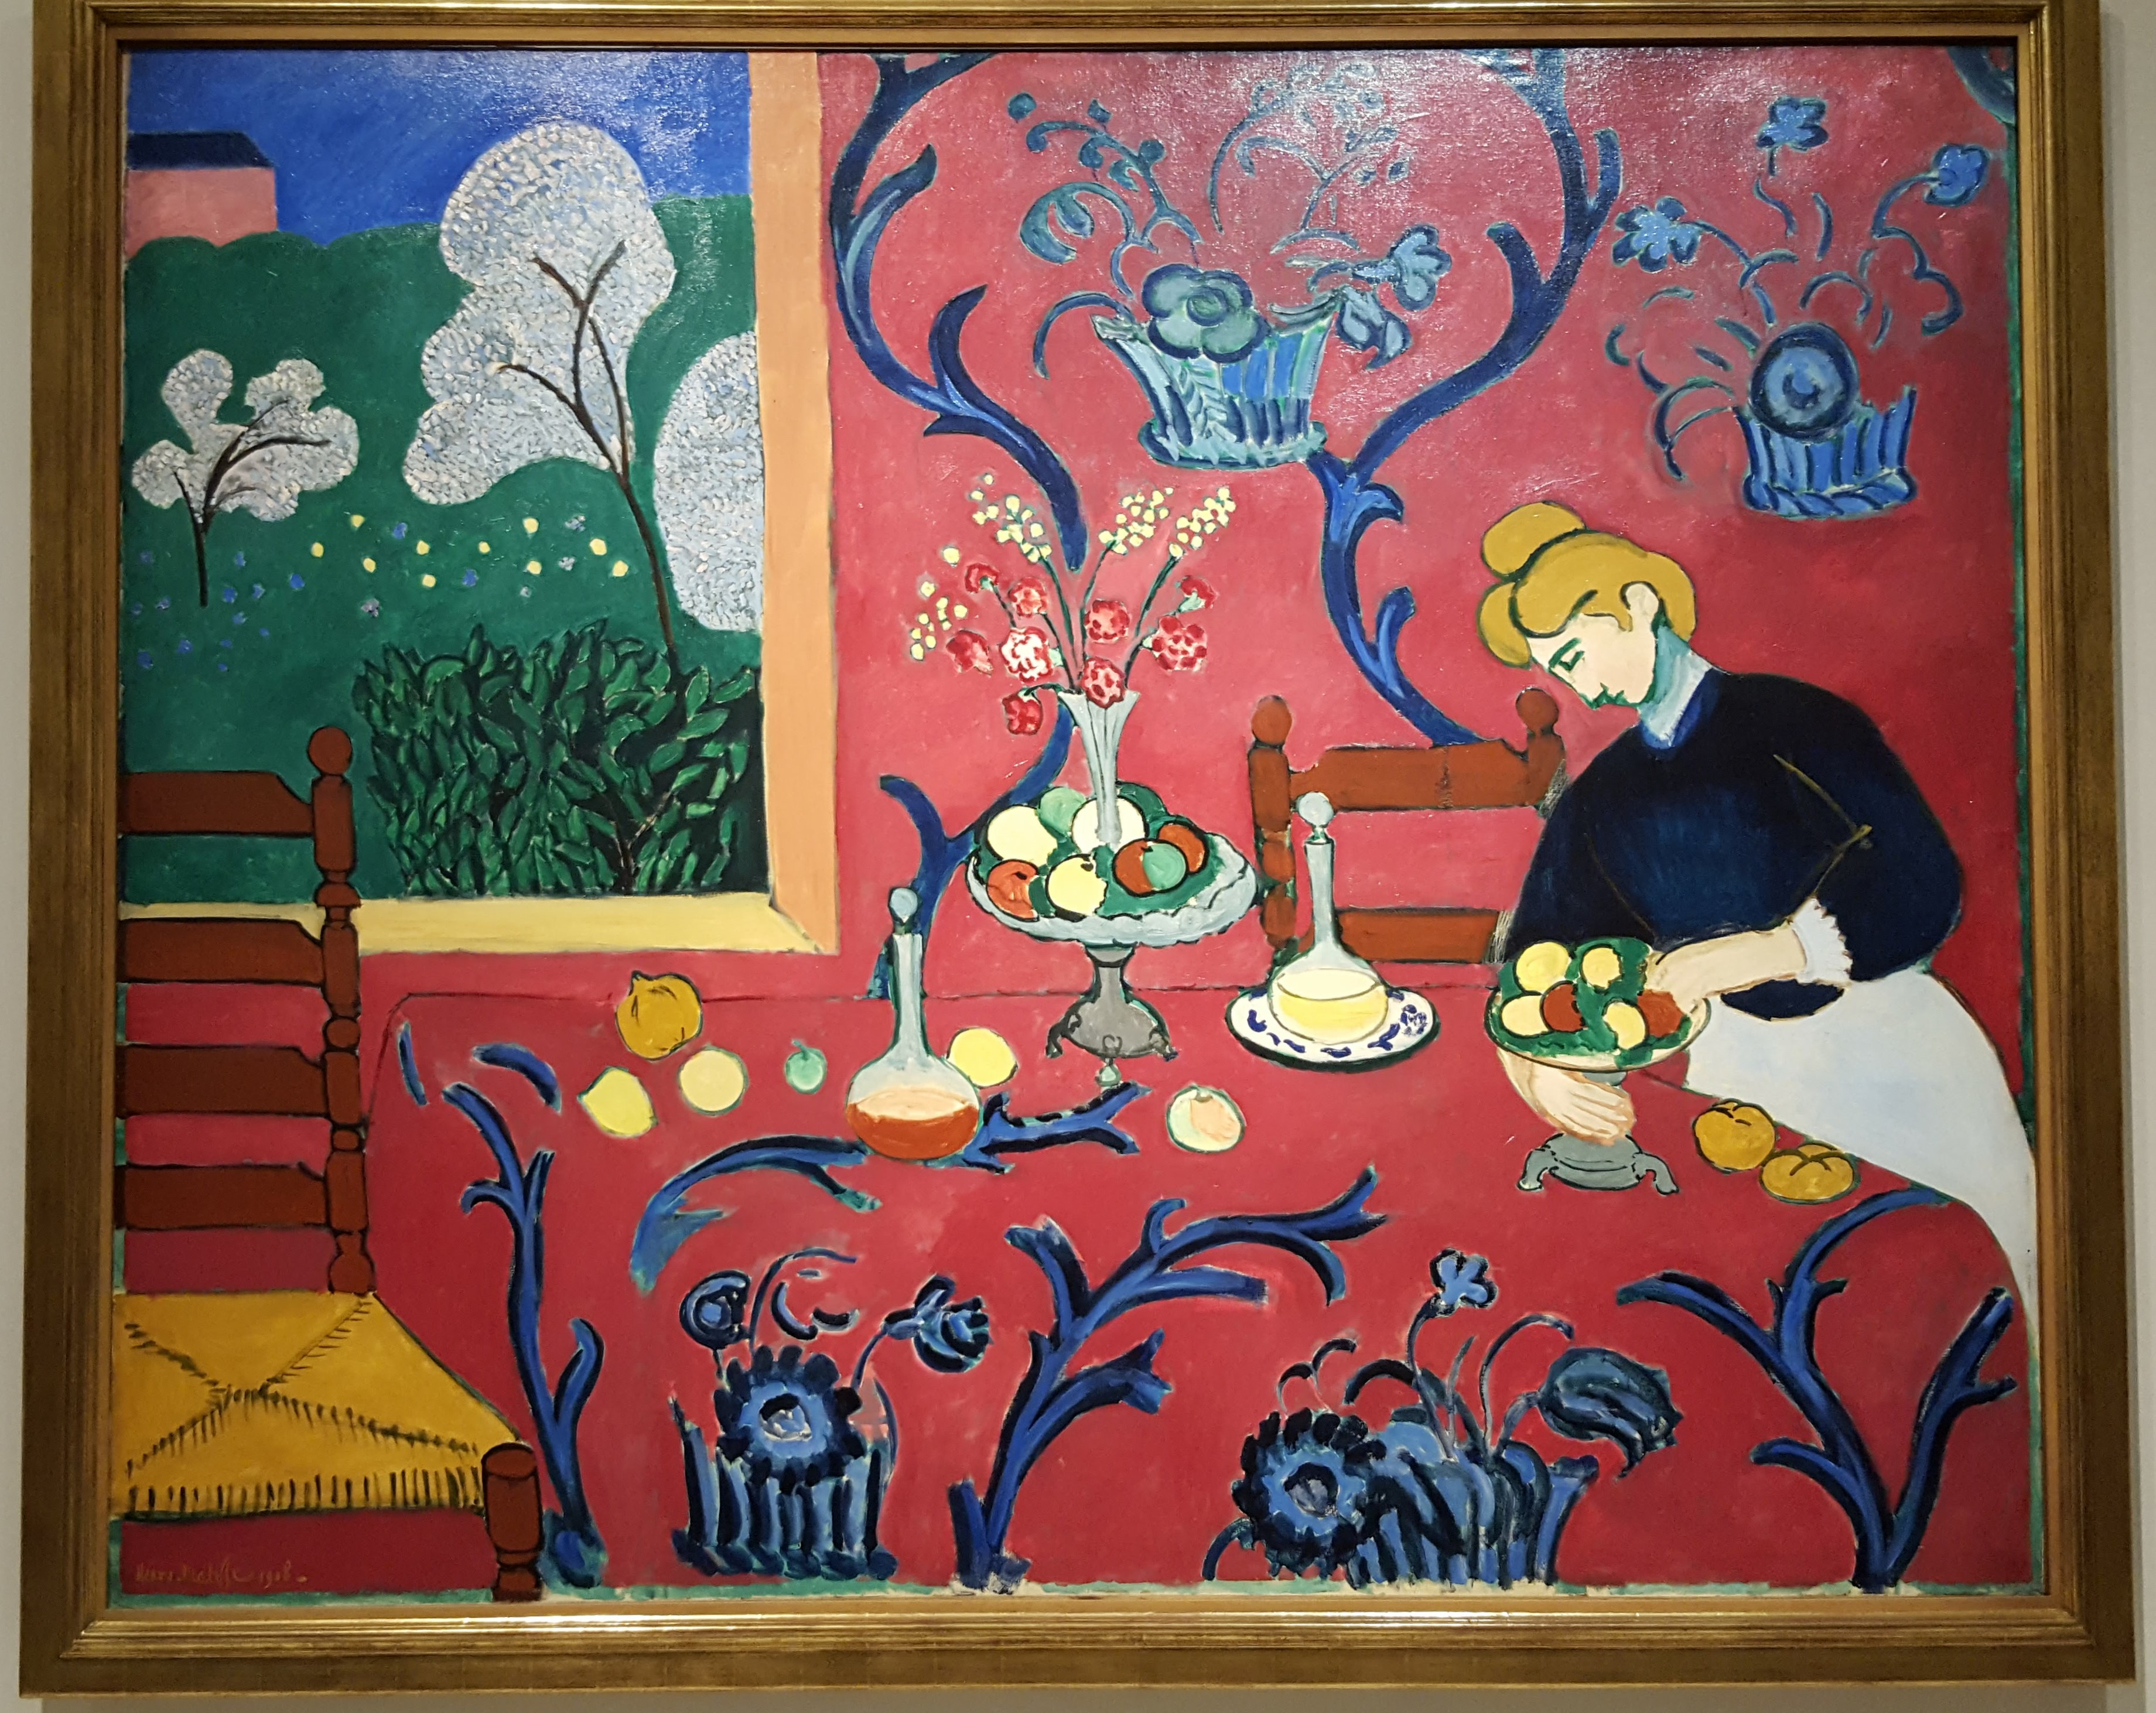 Matisse, The Dessert, 1908